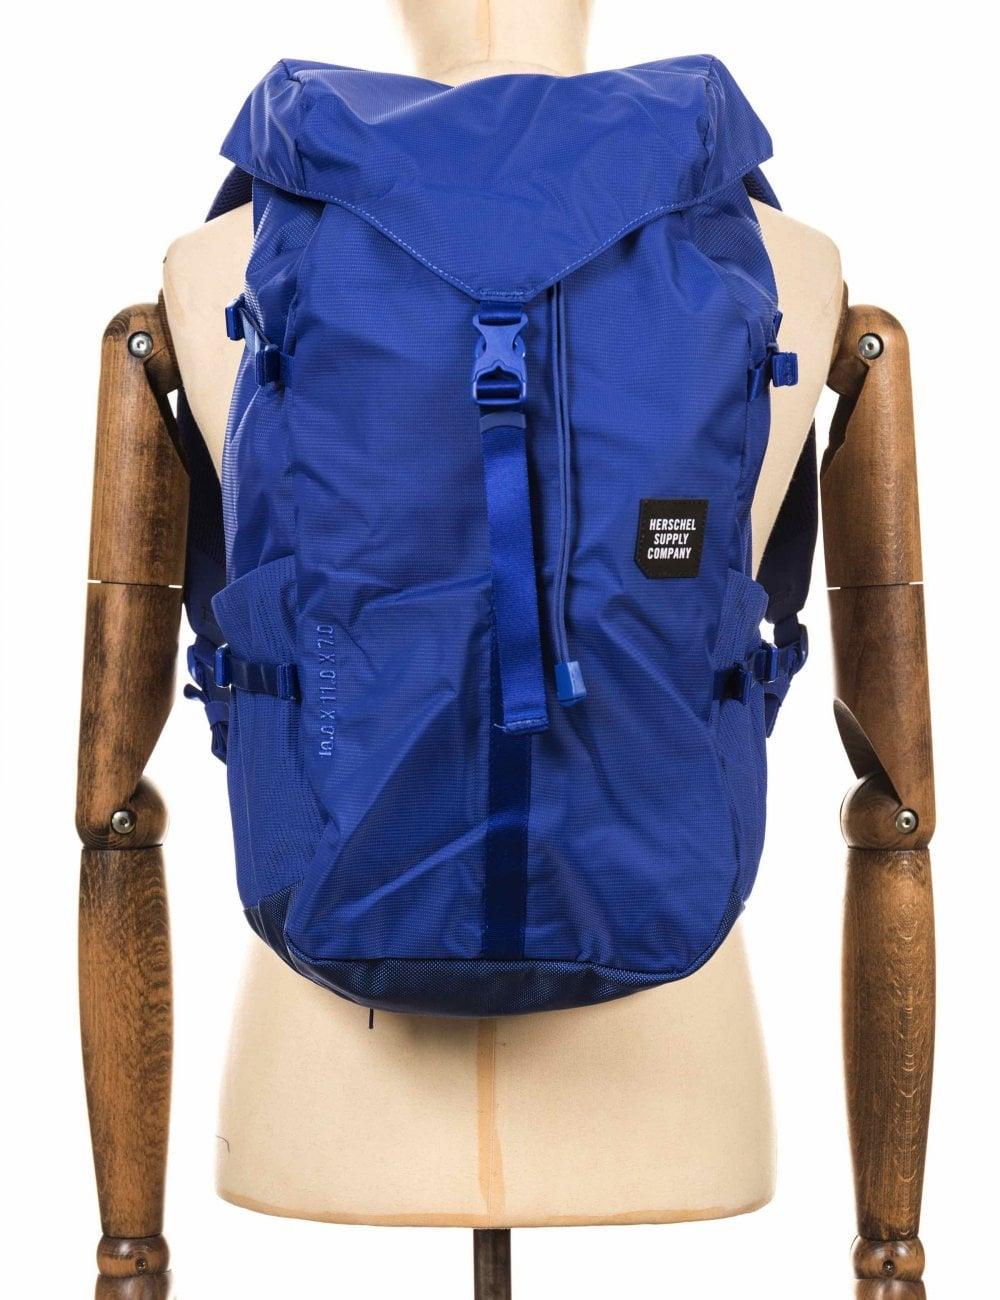 6849f2daa37 Herschel Supply Co Barlow Trail Backpack Large 27L - Deep Ultramarine